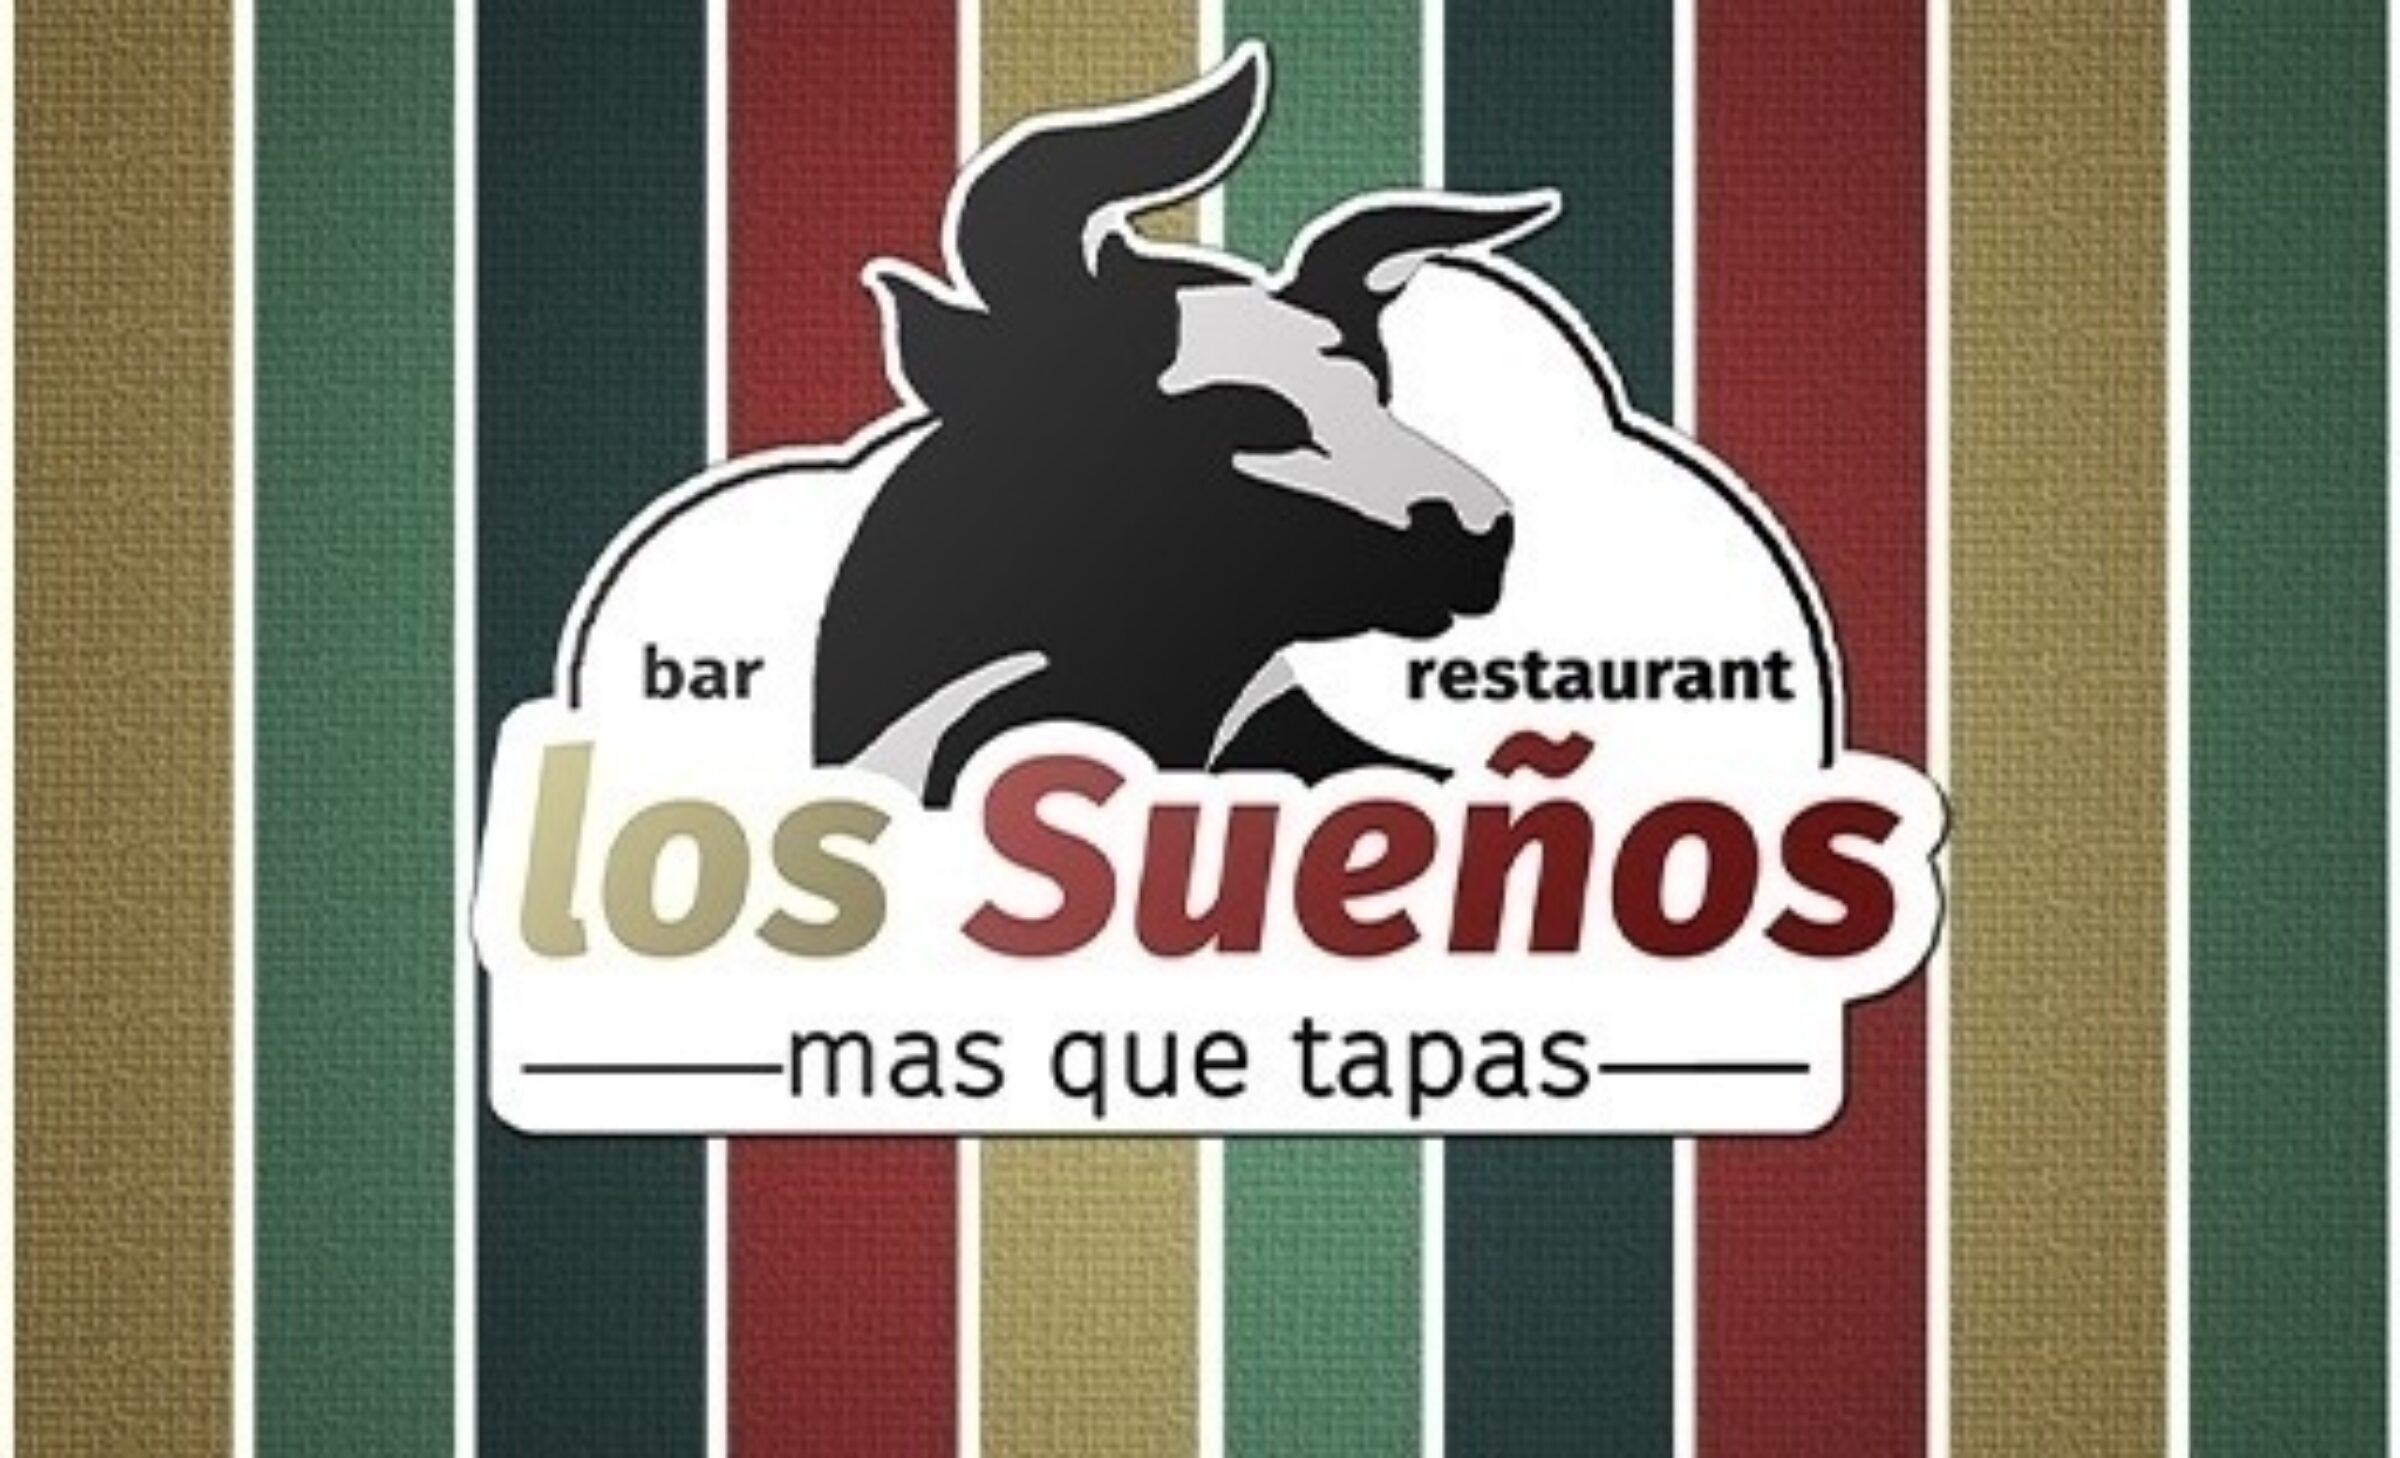 Restaurant Los Suenos 2 3782 1578998563 35i1wgmdok